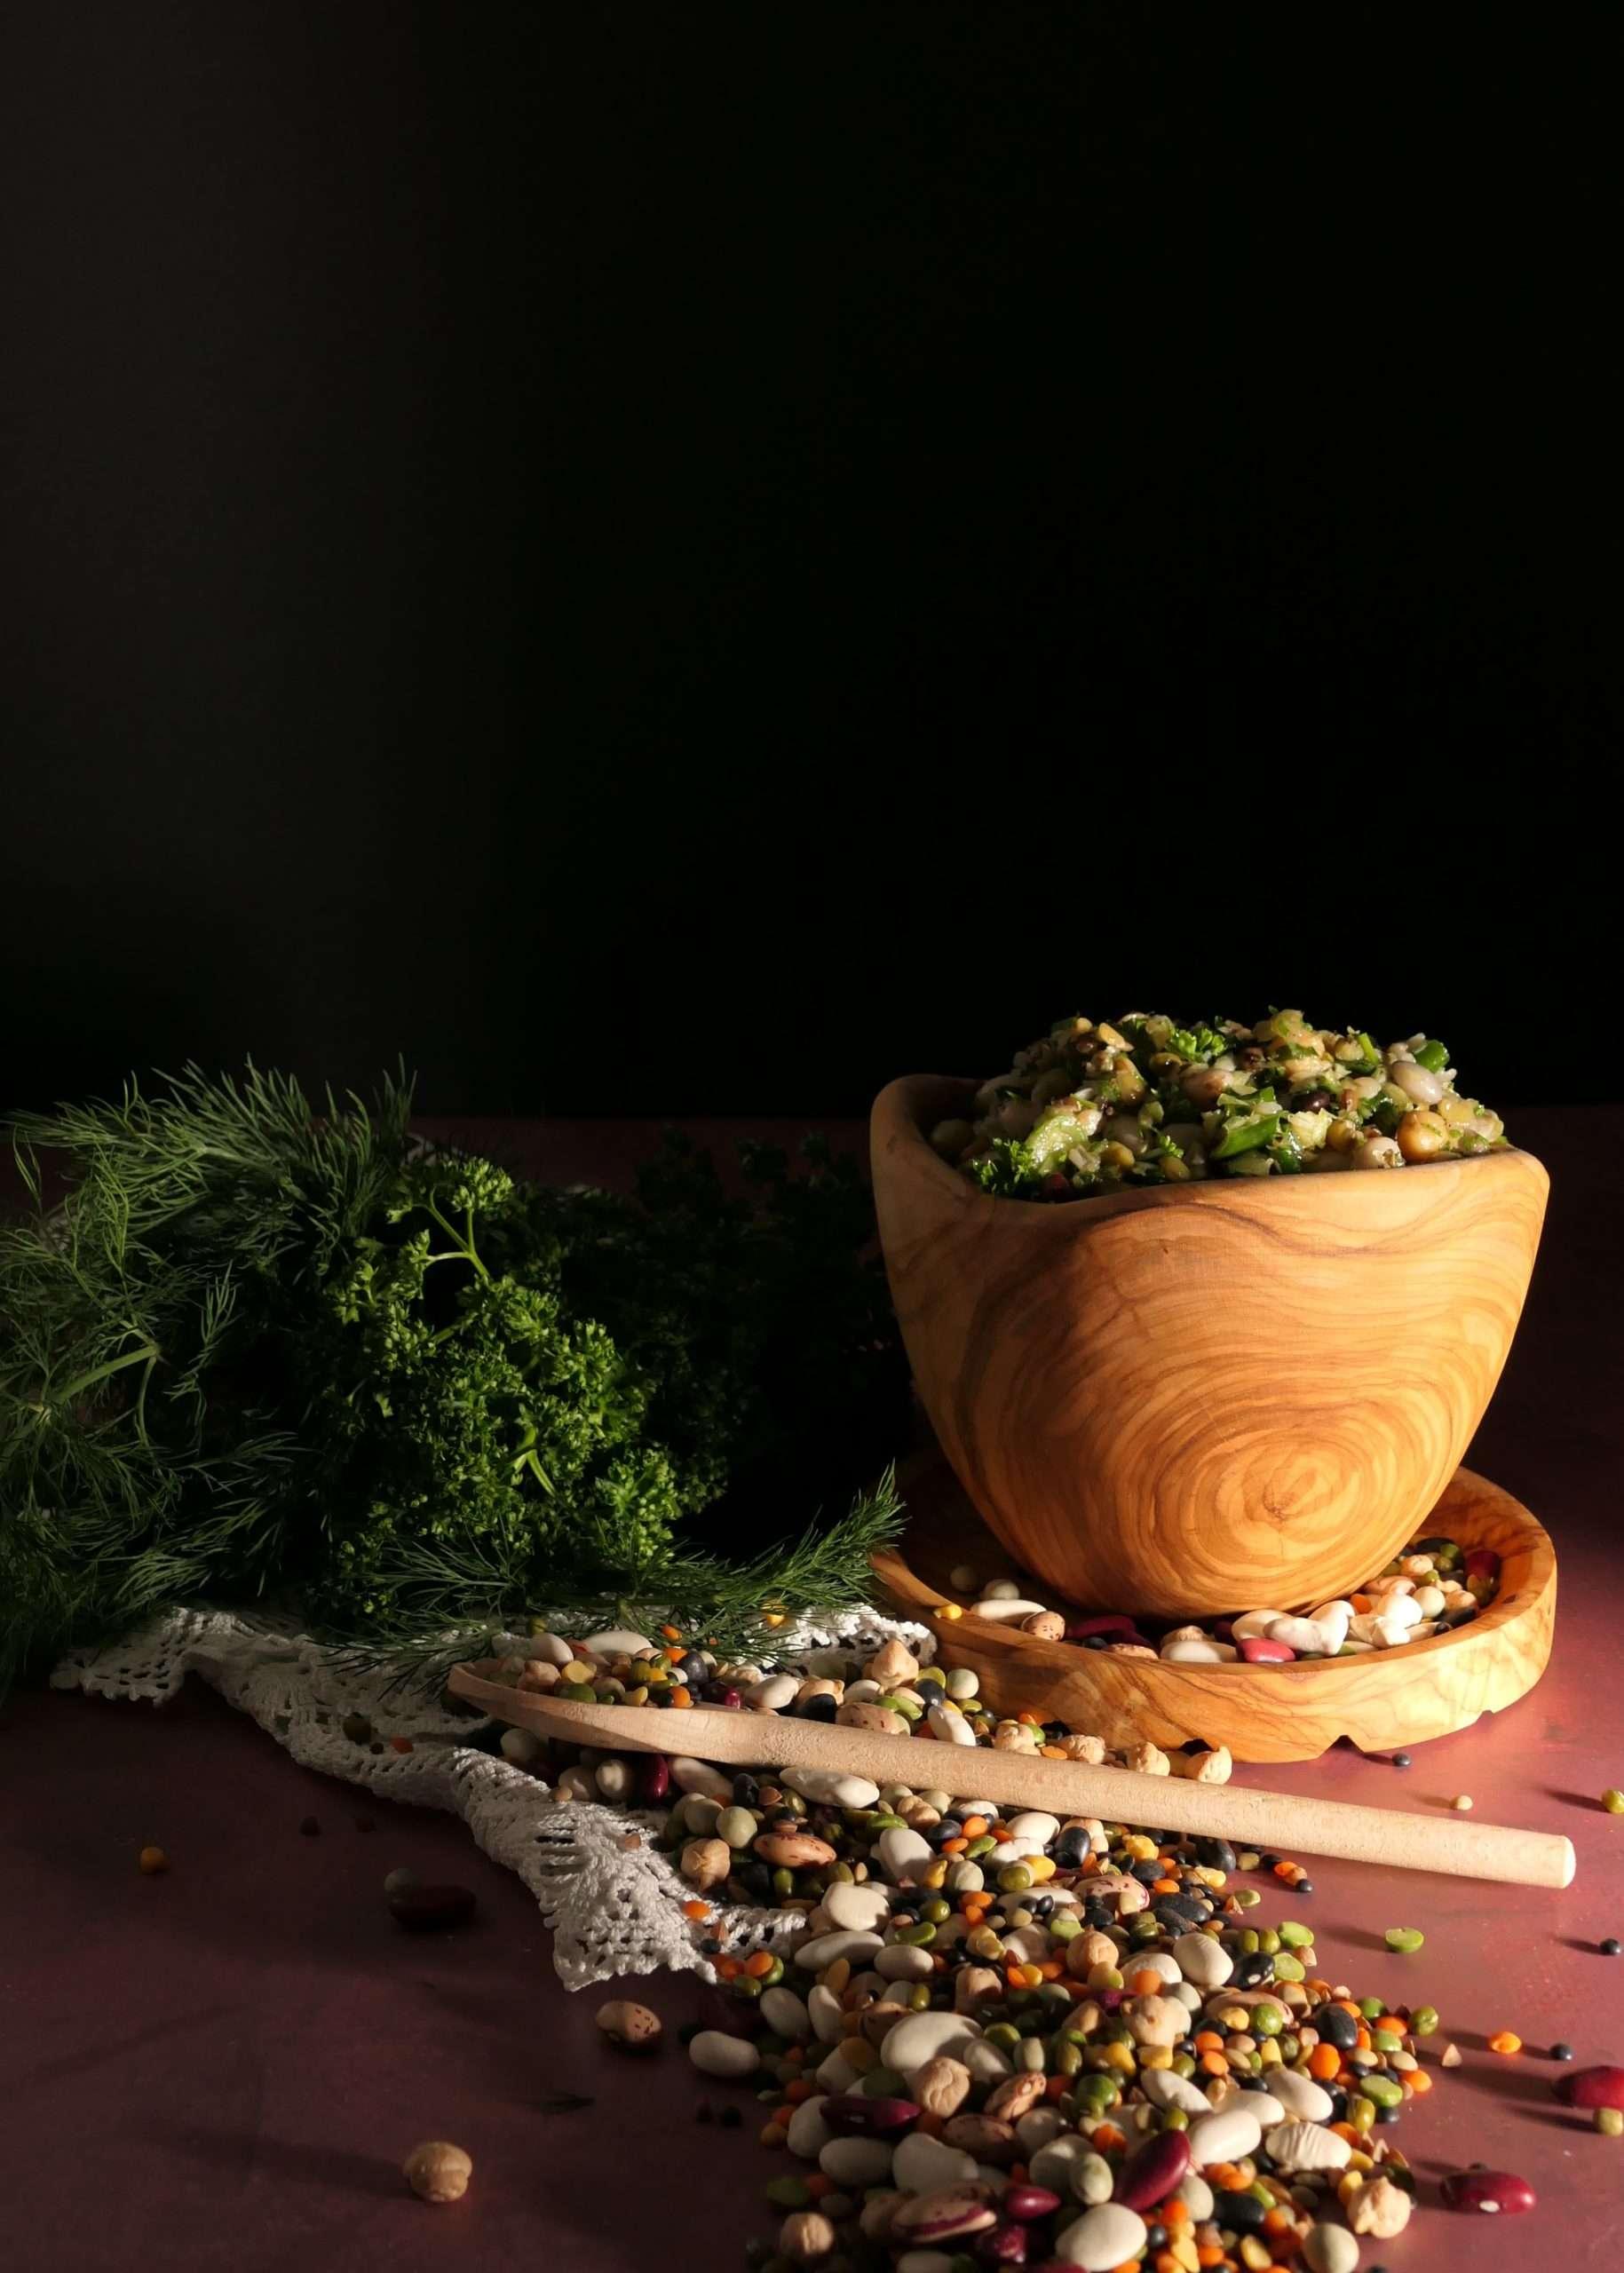 salde grecque aux legumes secs